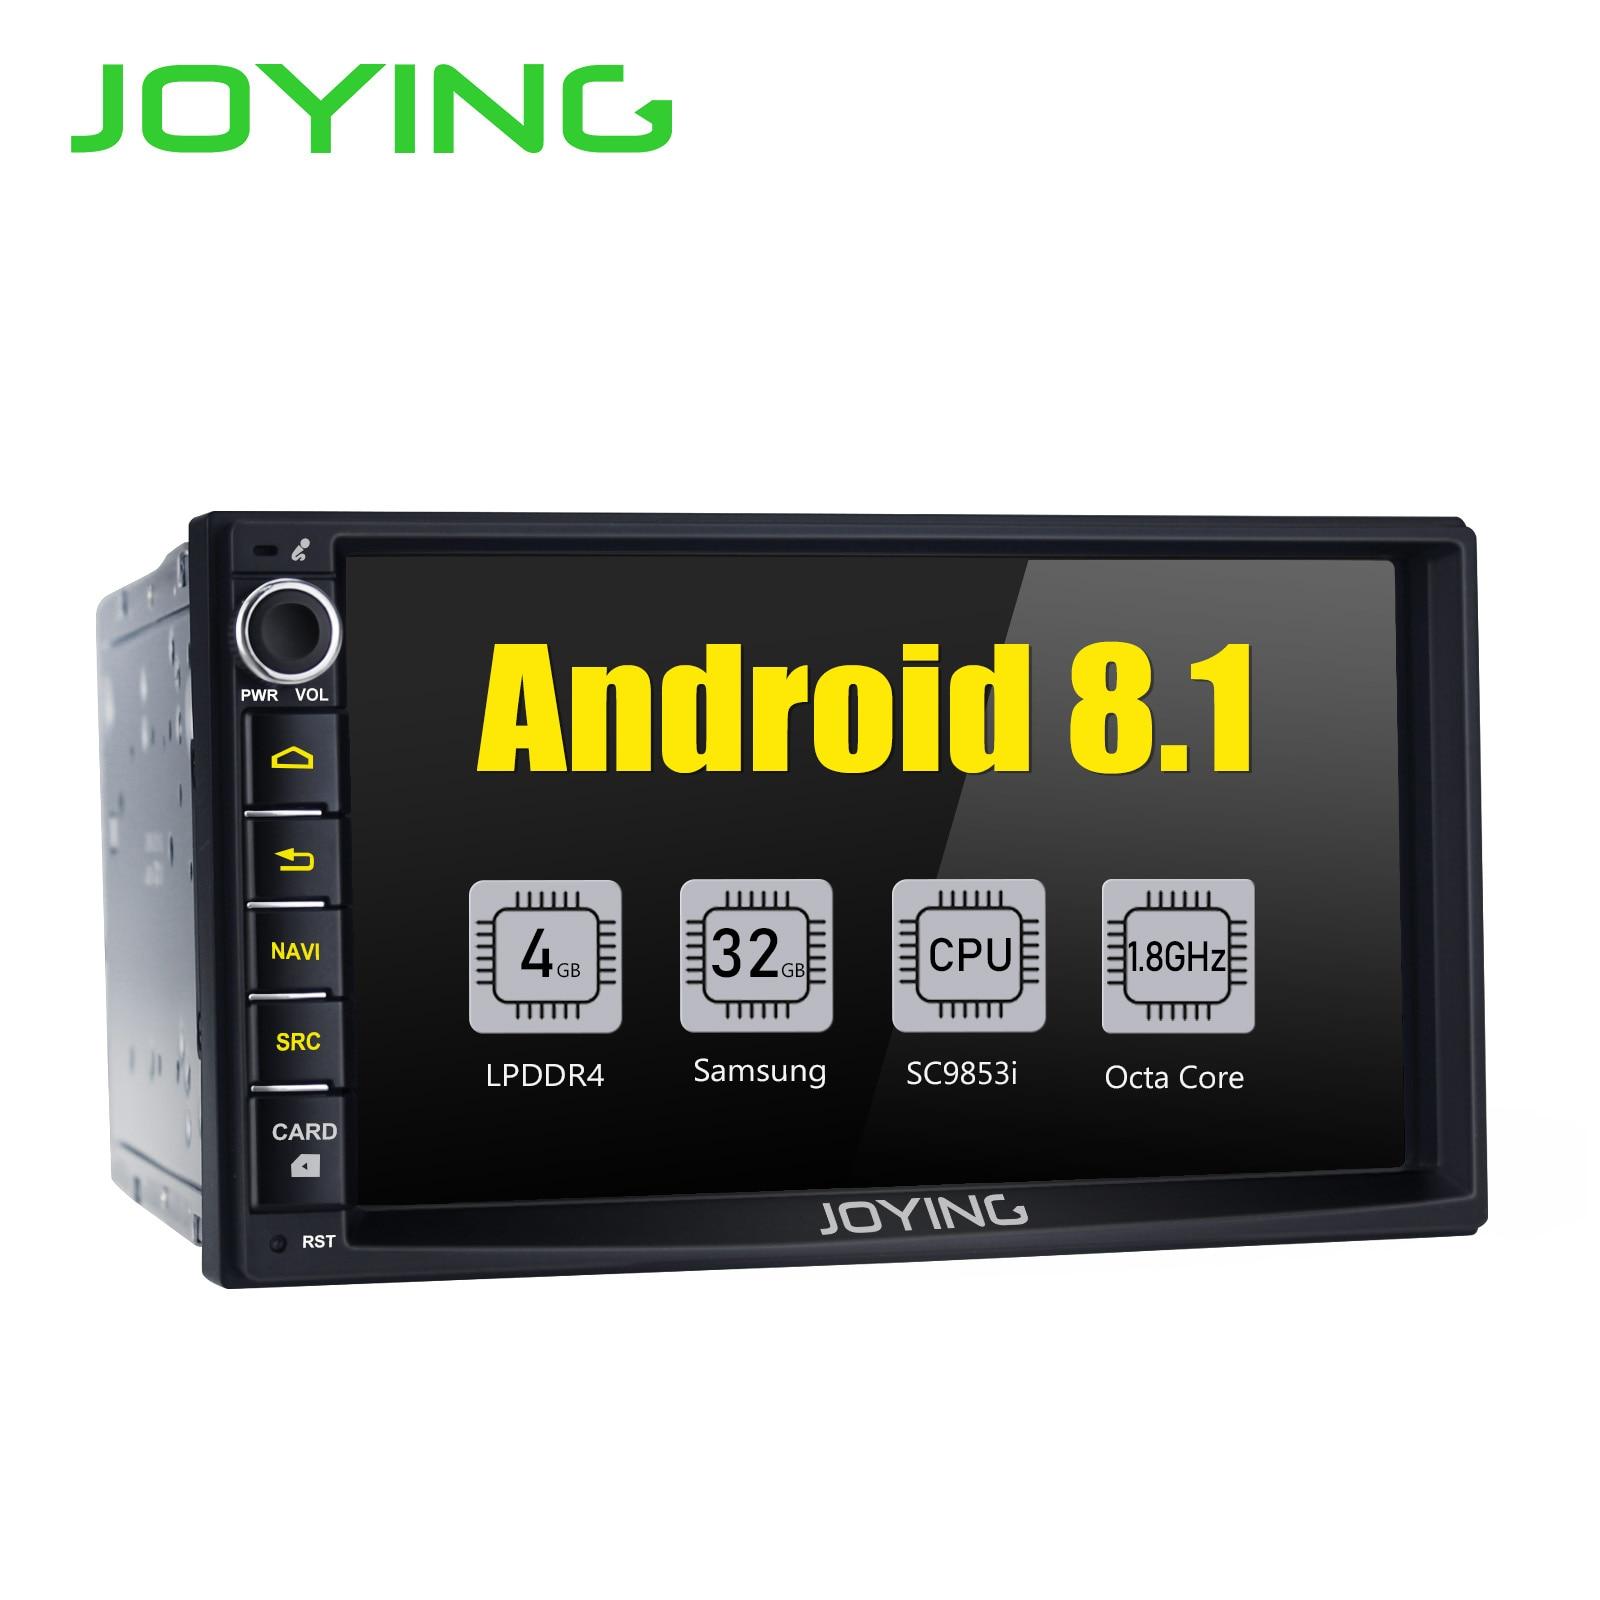 JOYING dernière 2 Din 7 ''Android 8.1 voiture autoradio HD unité principale GPS stéréo Radio avec Intel Octa core 4G Carplay Android auto DSP